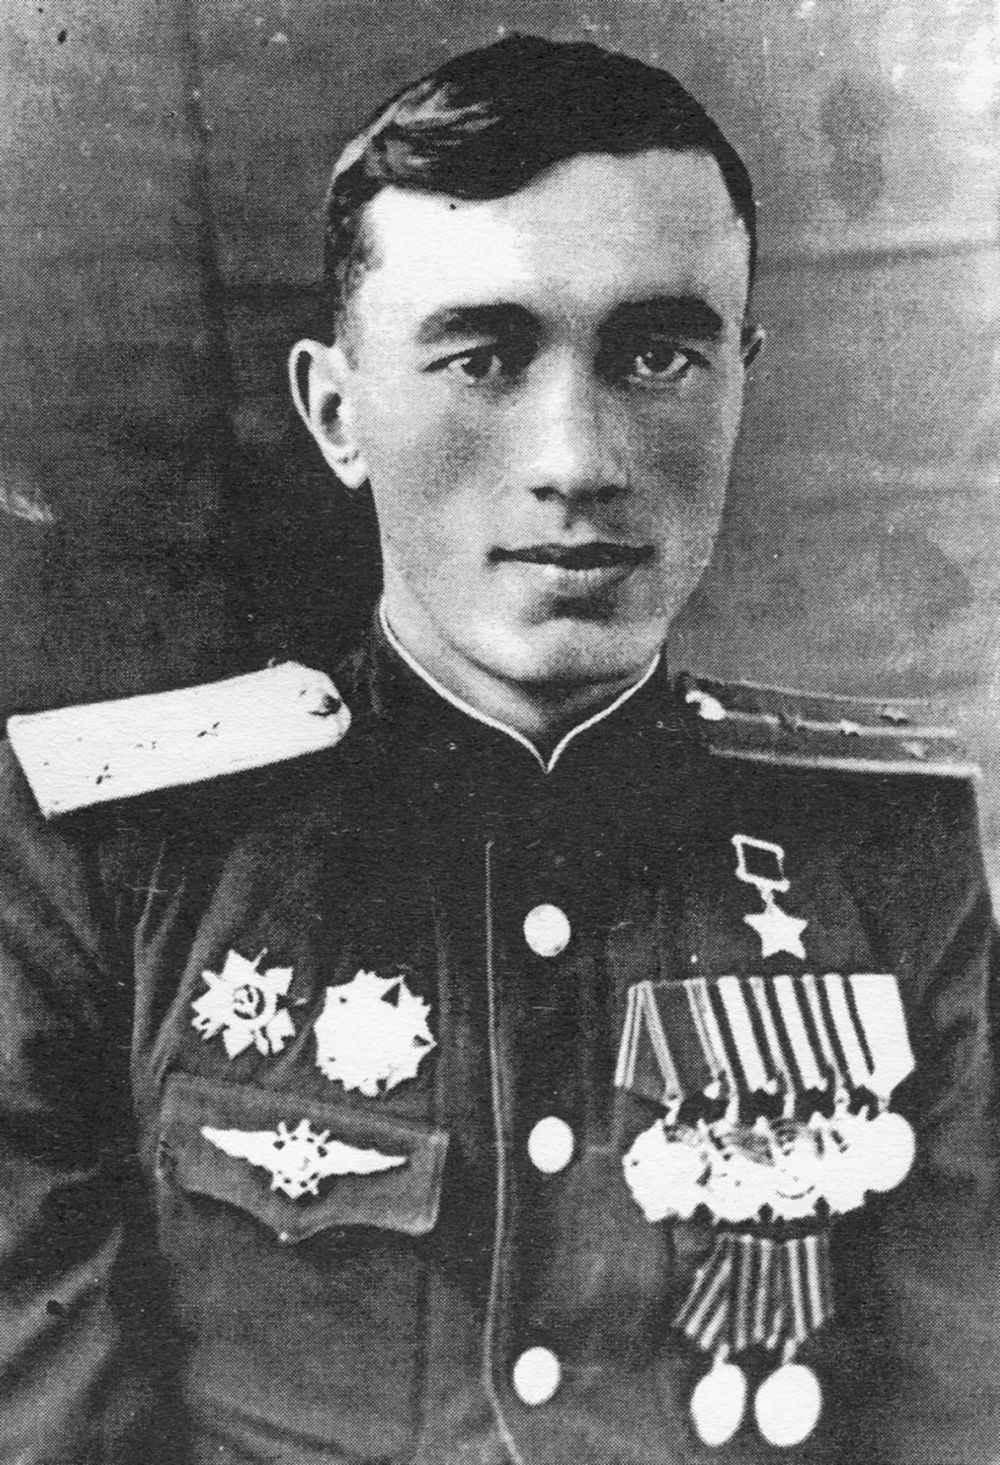 Летчик-штурмовик капитан Ю.А. Акаев